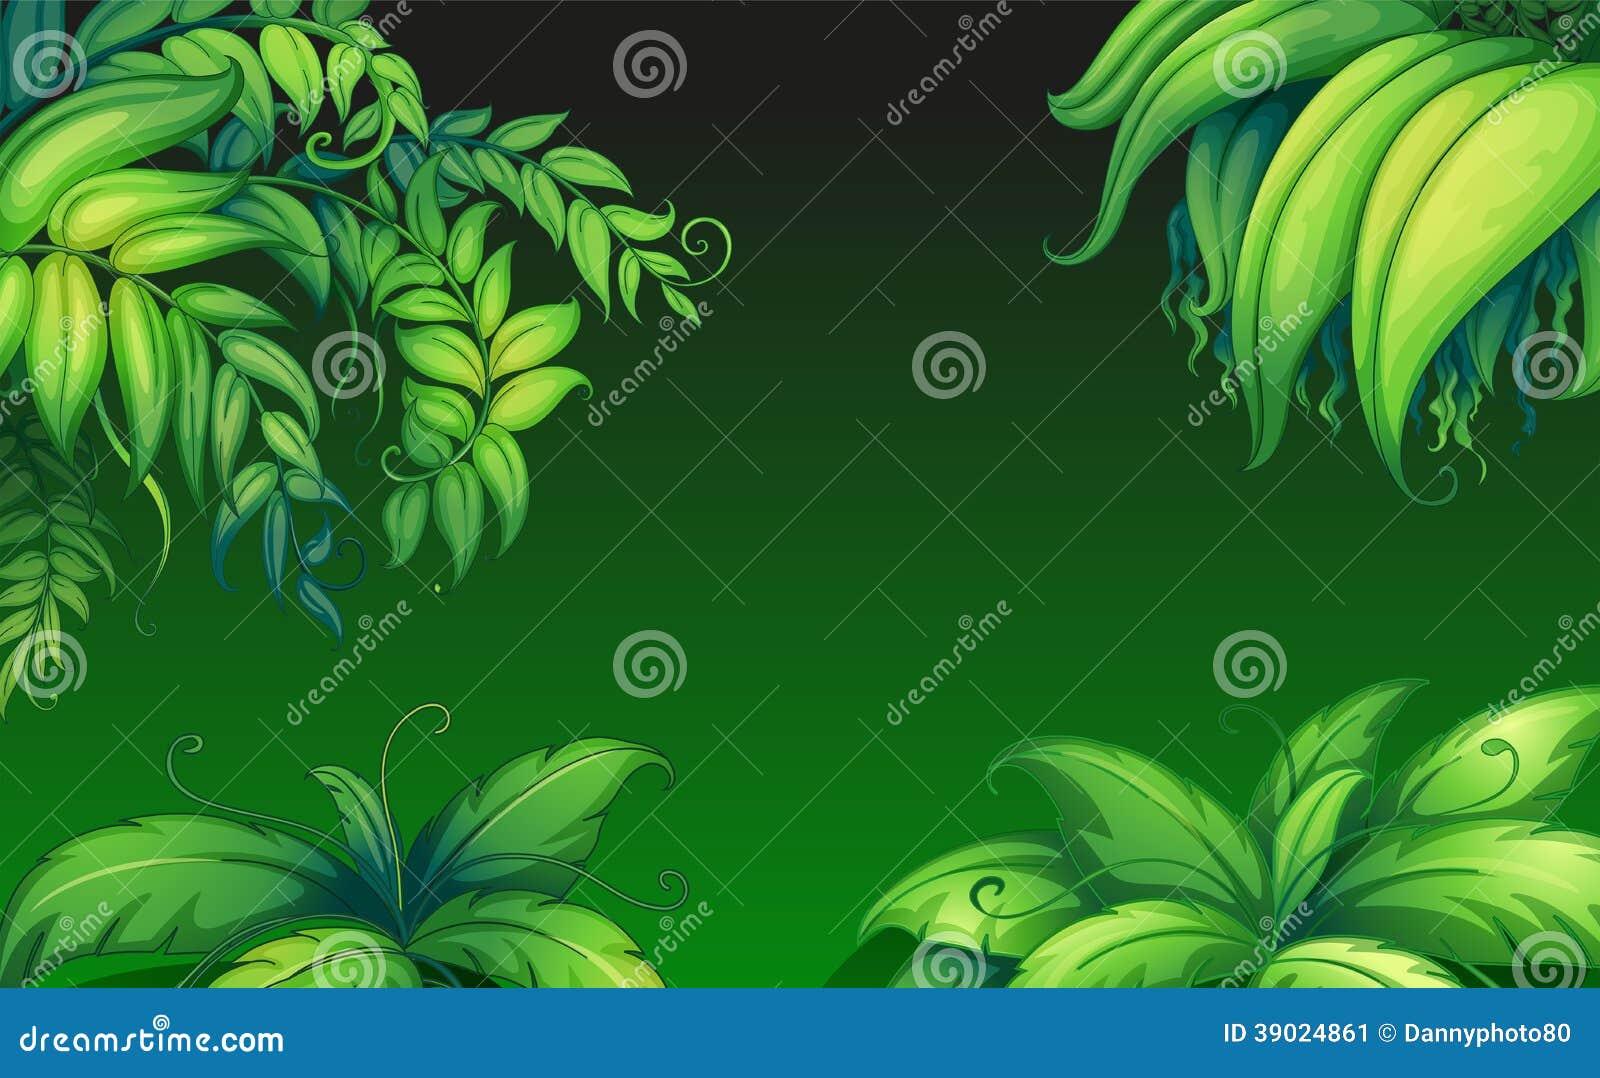 Green leafy plants stock vector image 39024861 - Leafy houseplants ...